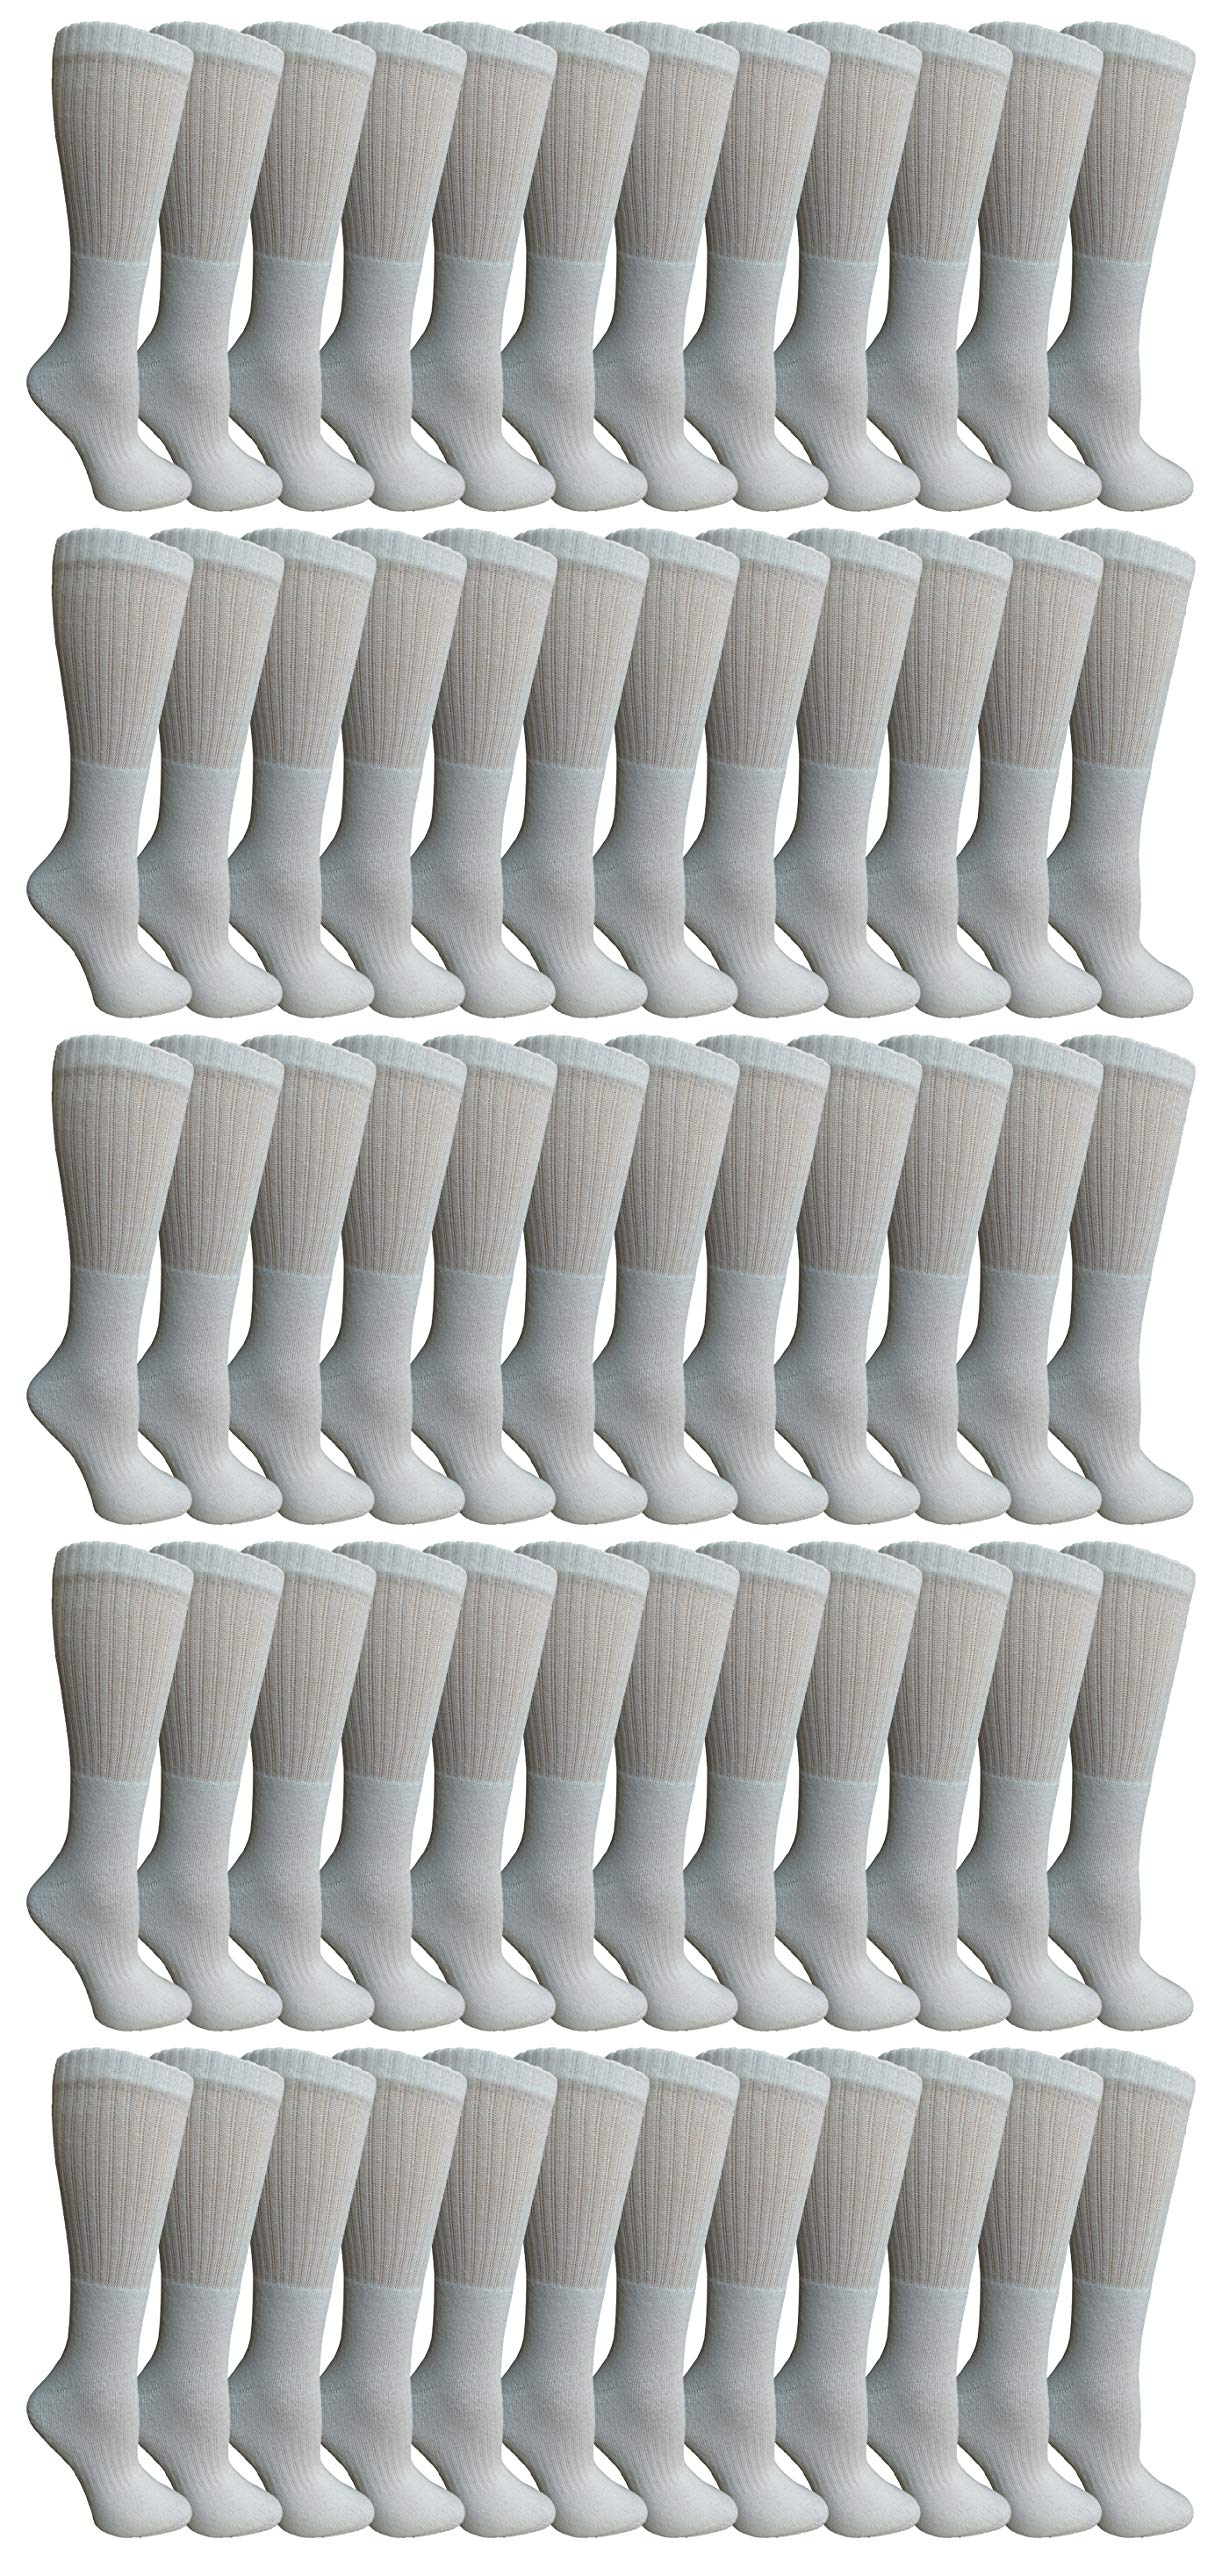 Yacht & Smith 60 Pairs of Kids Sports Crew Socks, Wholesale Bulk Pack Sock by SOCKS'NBULK (White)